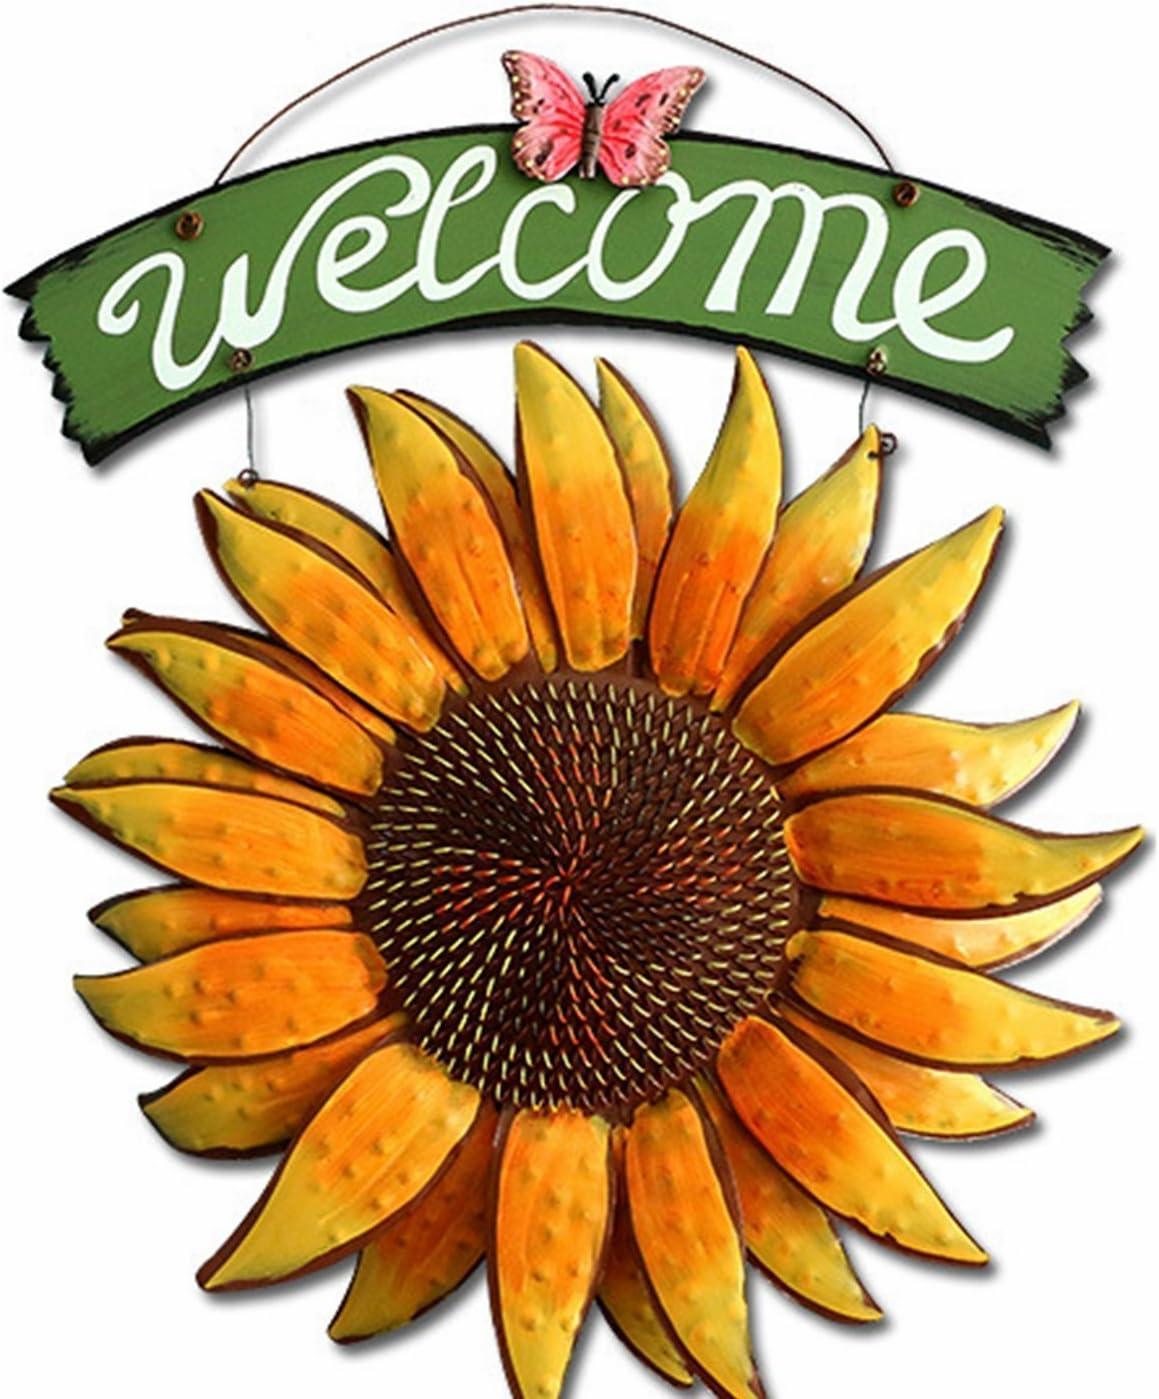 Grace Home Max 81% OFF Metal Vintage Hanging Welcome Door Sign Flower Decor Finally resale start